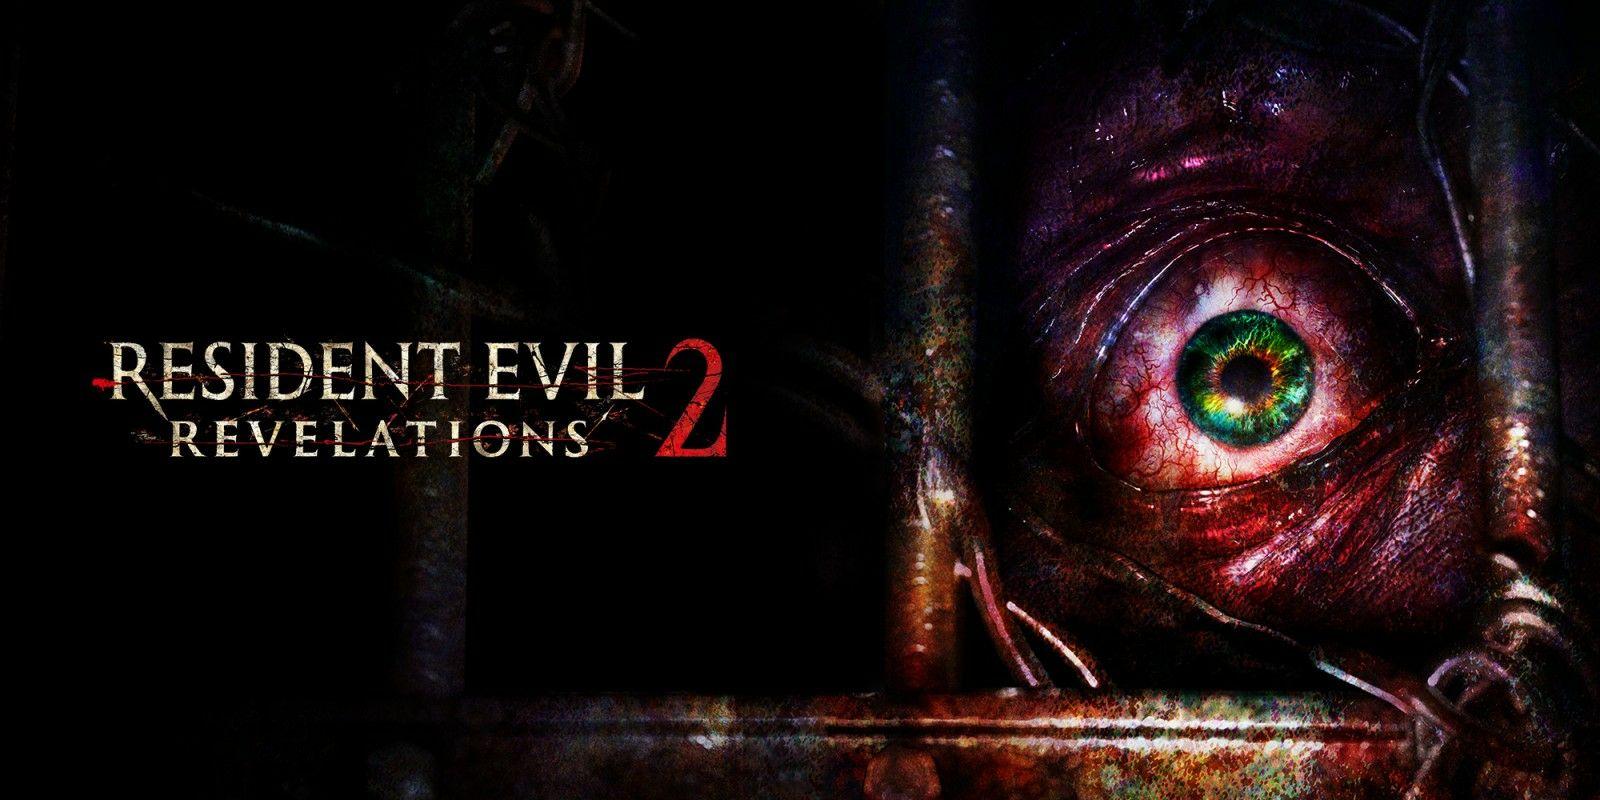 Resident Evil Revelations 2 Nintendo Switch £7.99 at Nintendo Shop